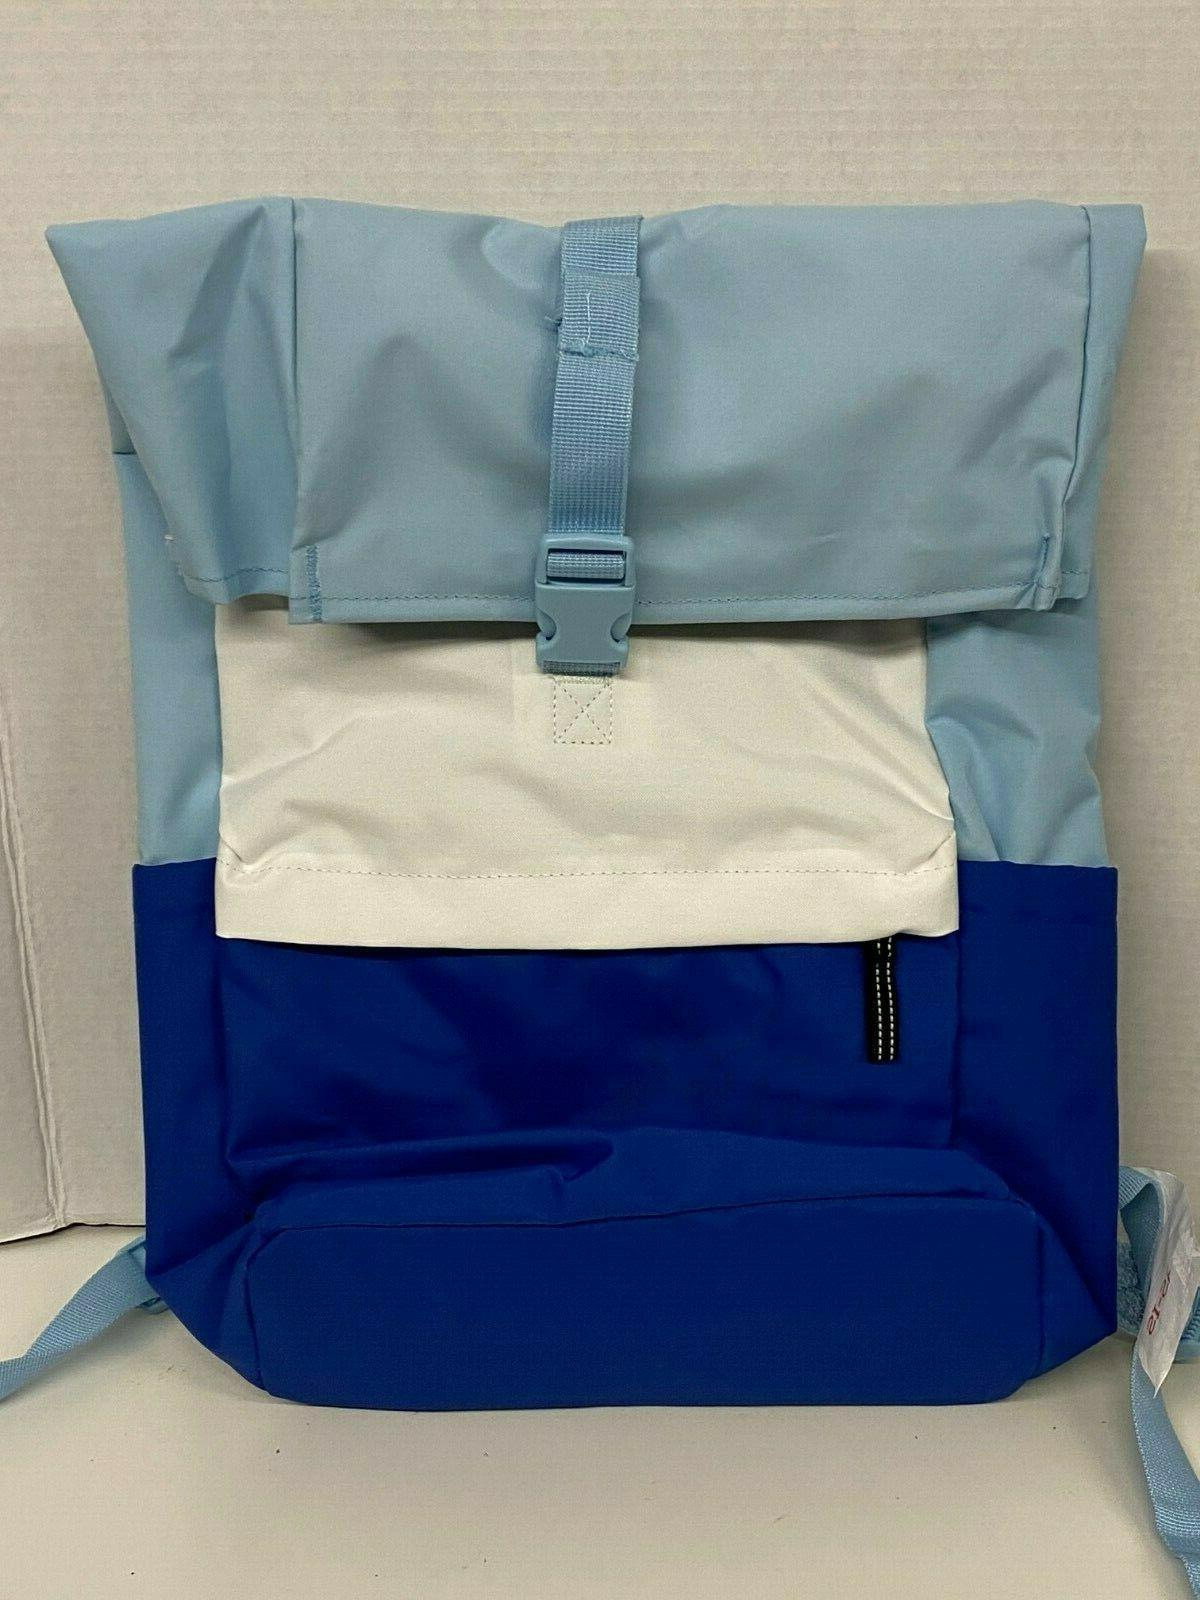 IKEA Bag Zip Laptop Pocket Blue